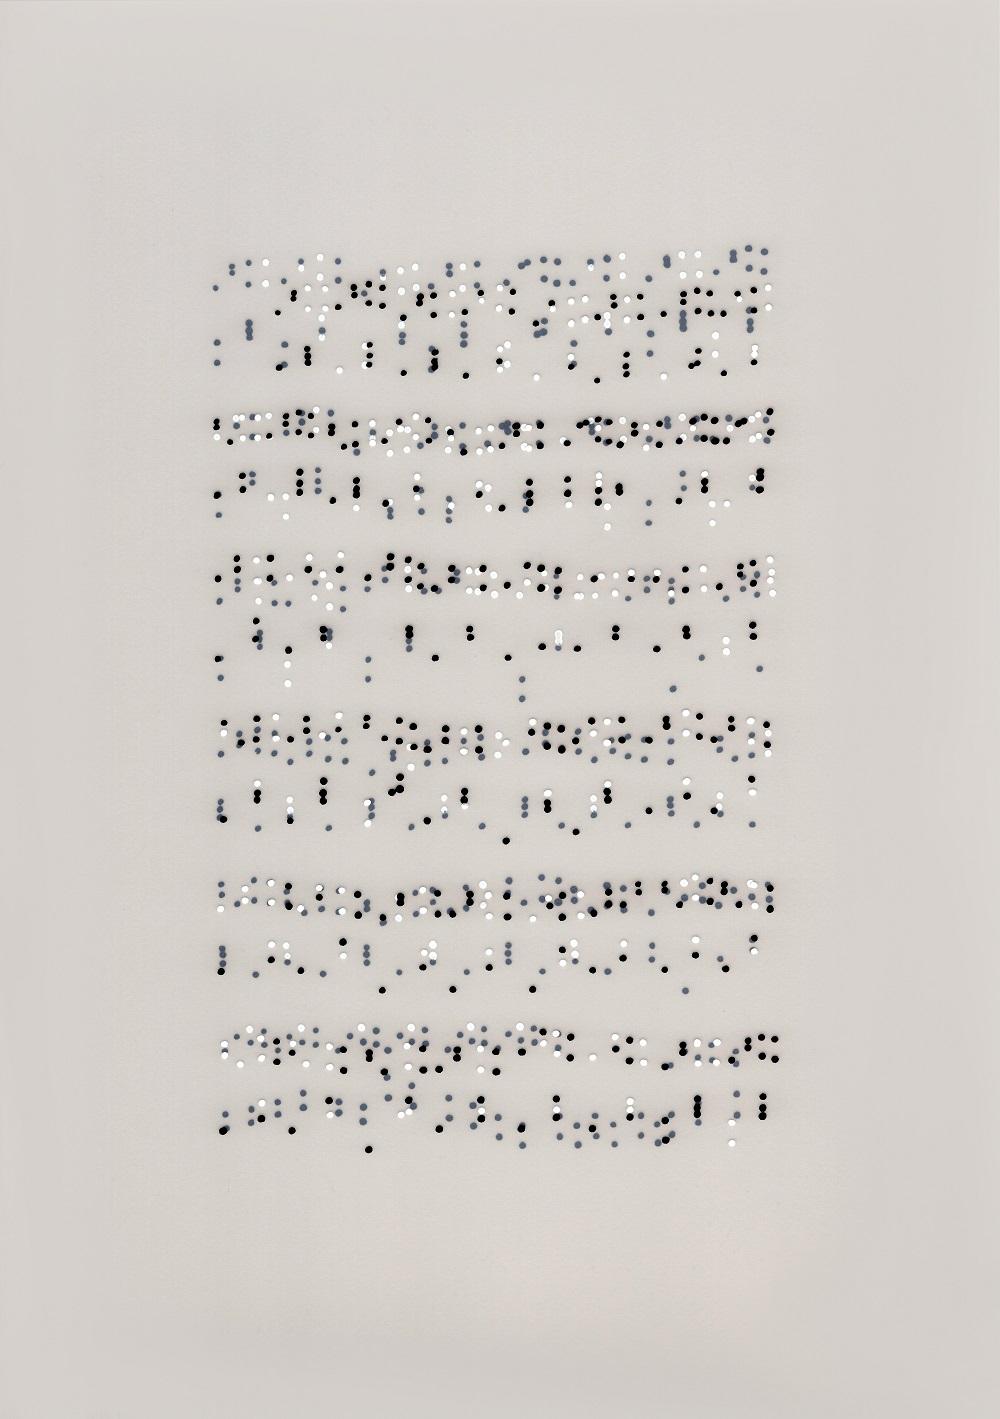 Neuma nº 25 (Chopin, Étude op.25 nº9) (2016) - Ana Perez Ventura